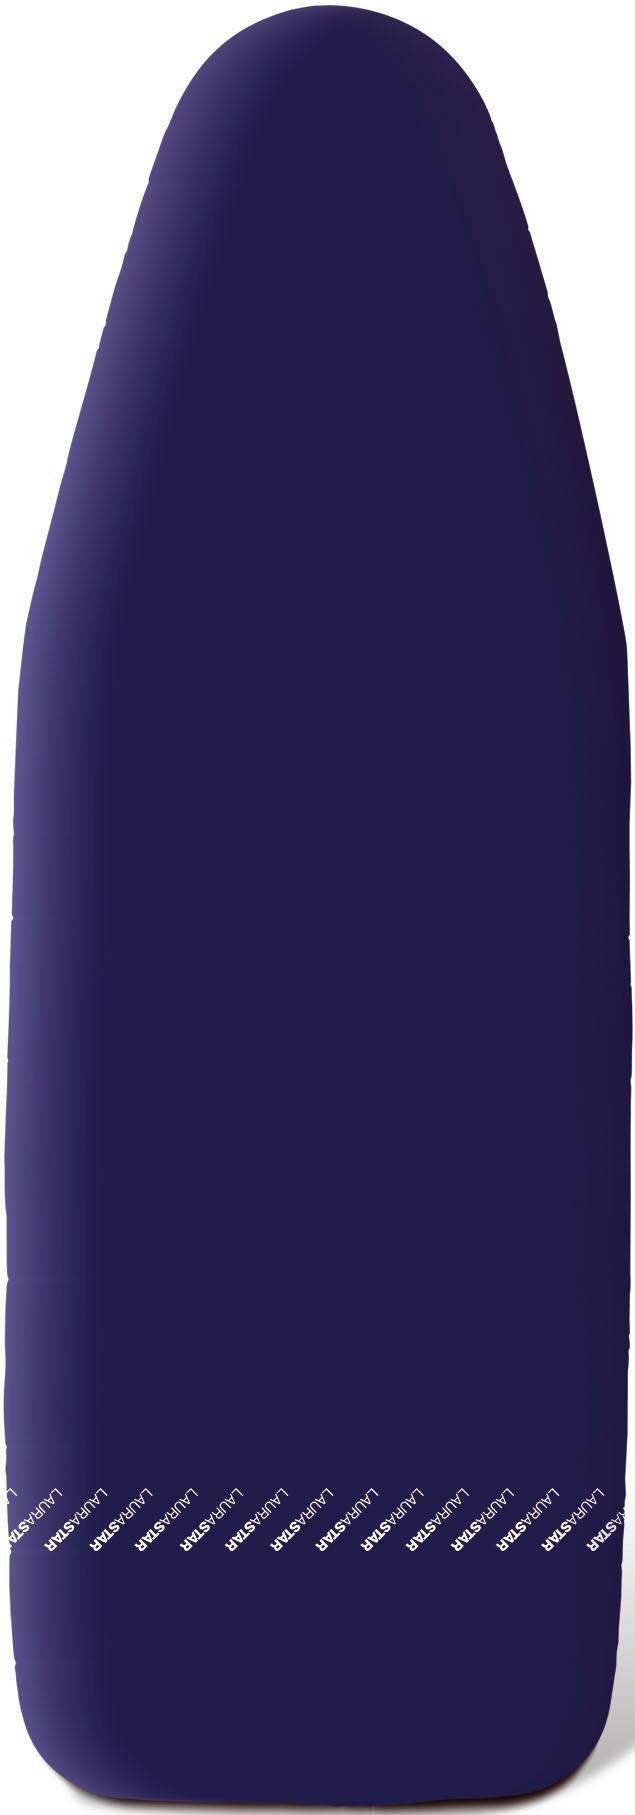 Laura-star Bügelbezug Mycover, violett